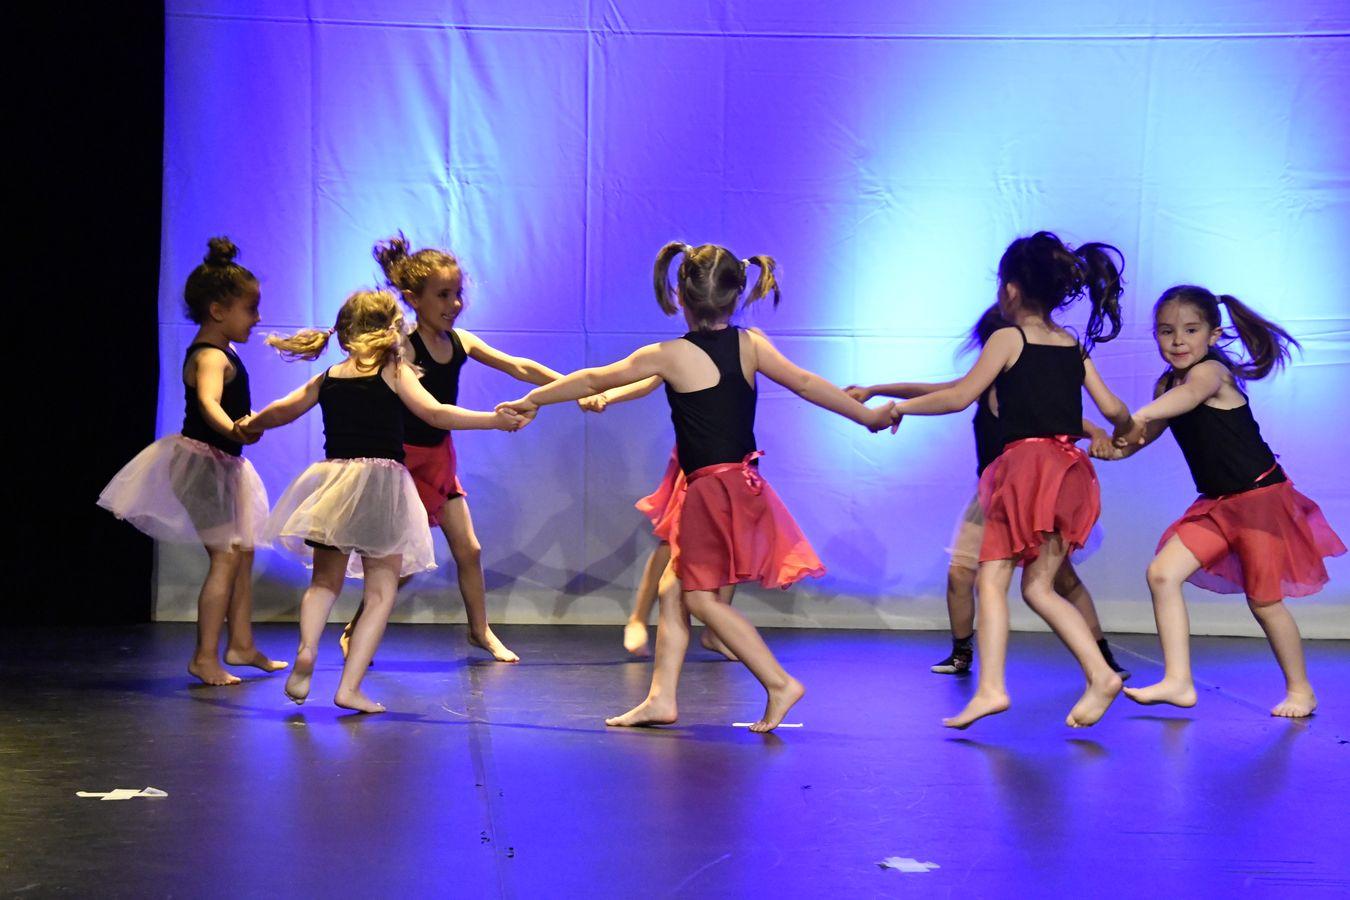 danse-et-vie_gala010